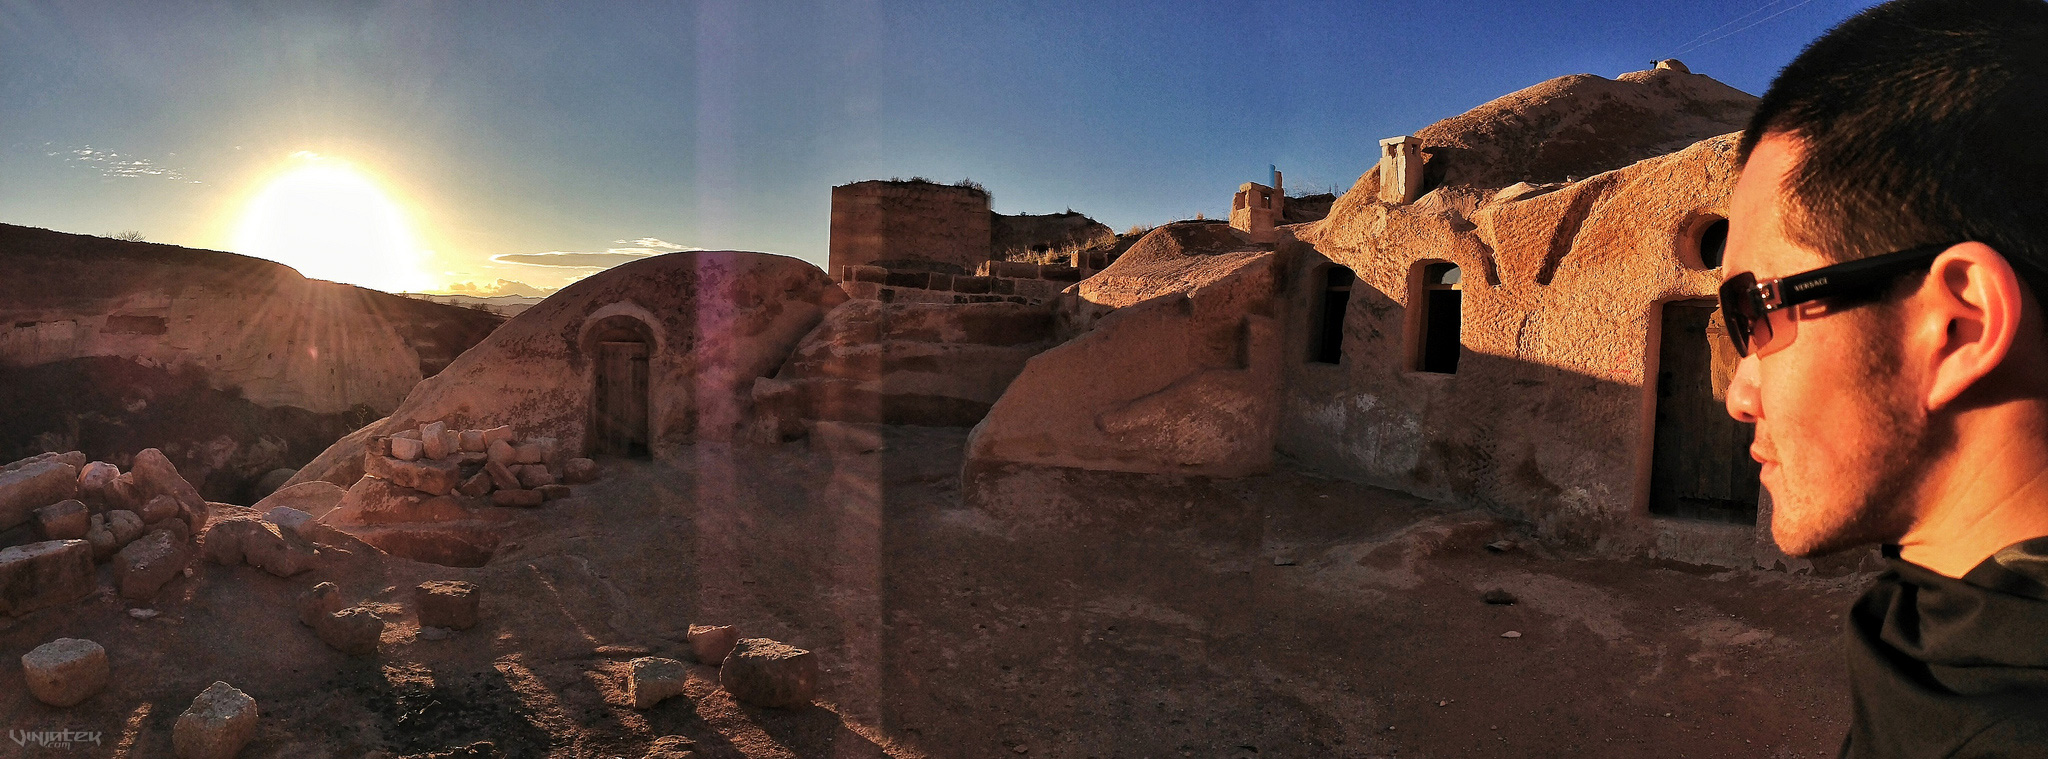 - Sunset Over The Cave Village of Cappadocia, Turkey -